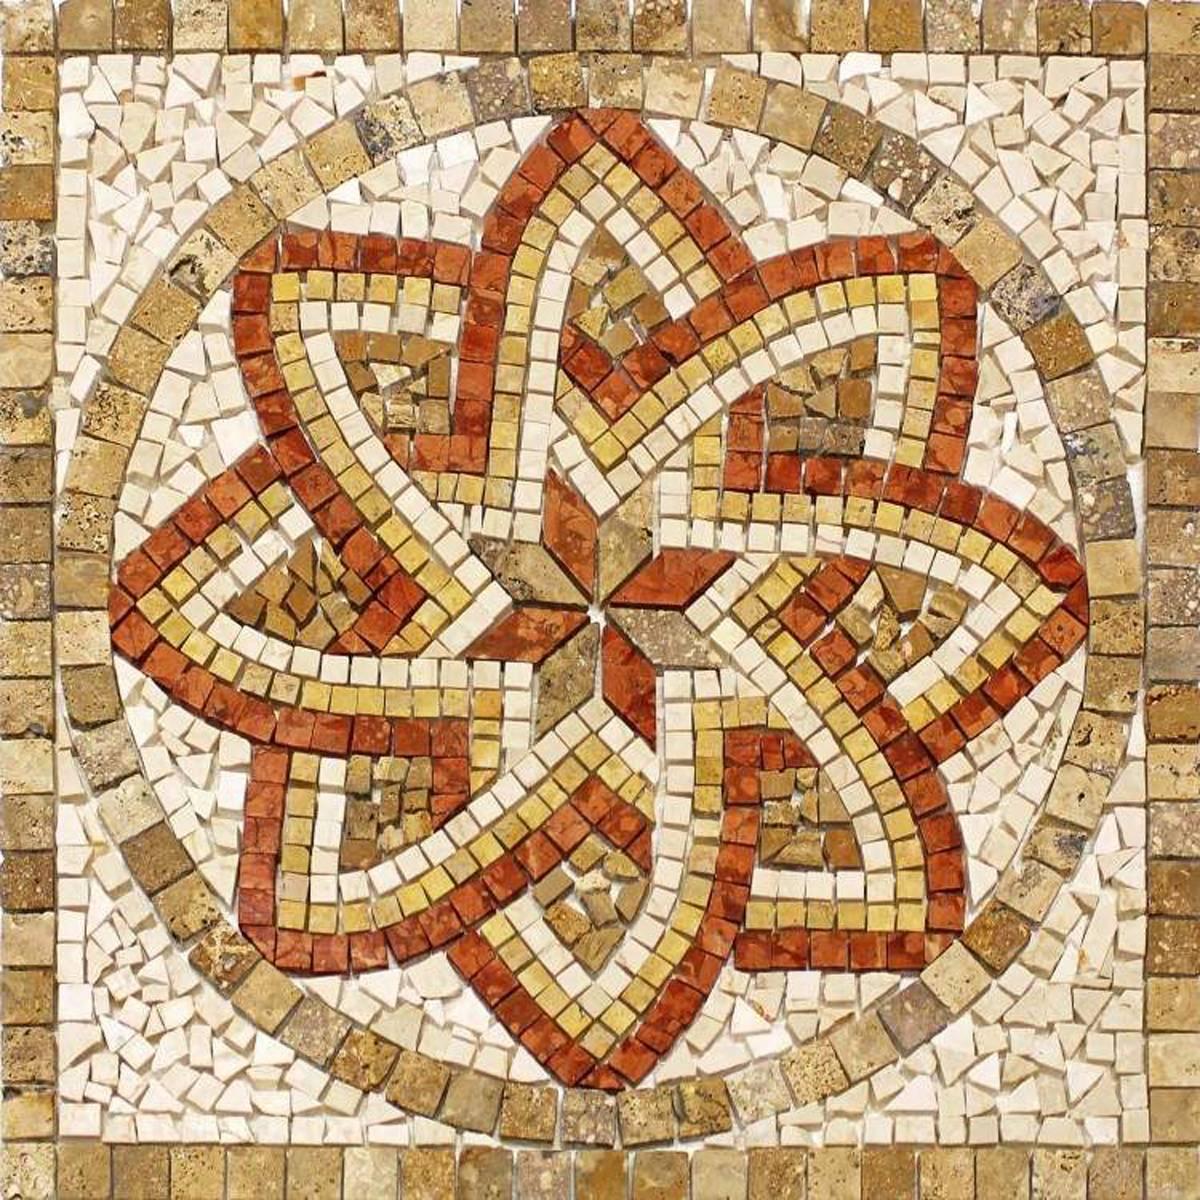 Rosoni rosone mosaico in marmo su rete per interni esterni 80x80 florium noce quaranta store - Piastrelle a mosaico ...